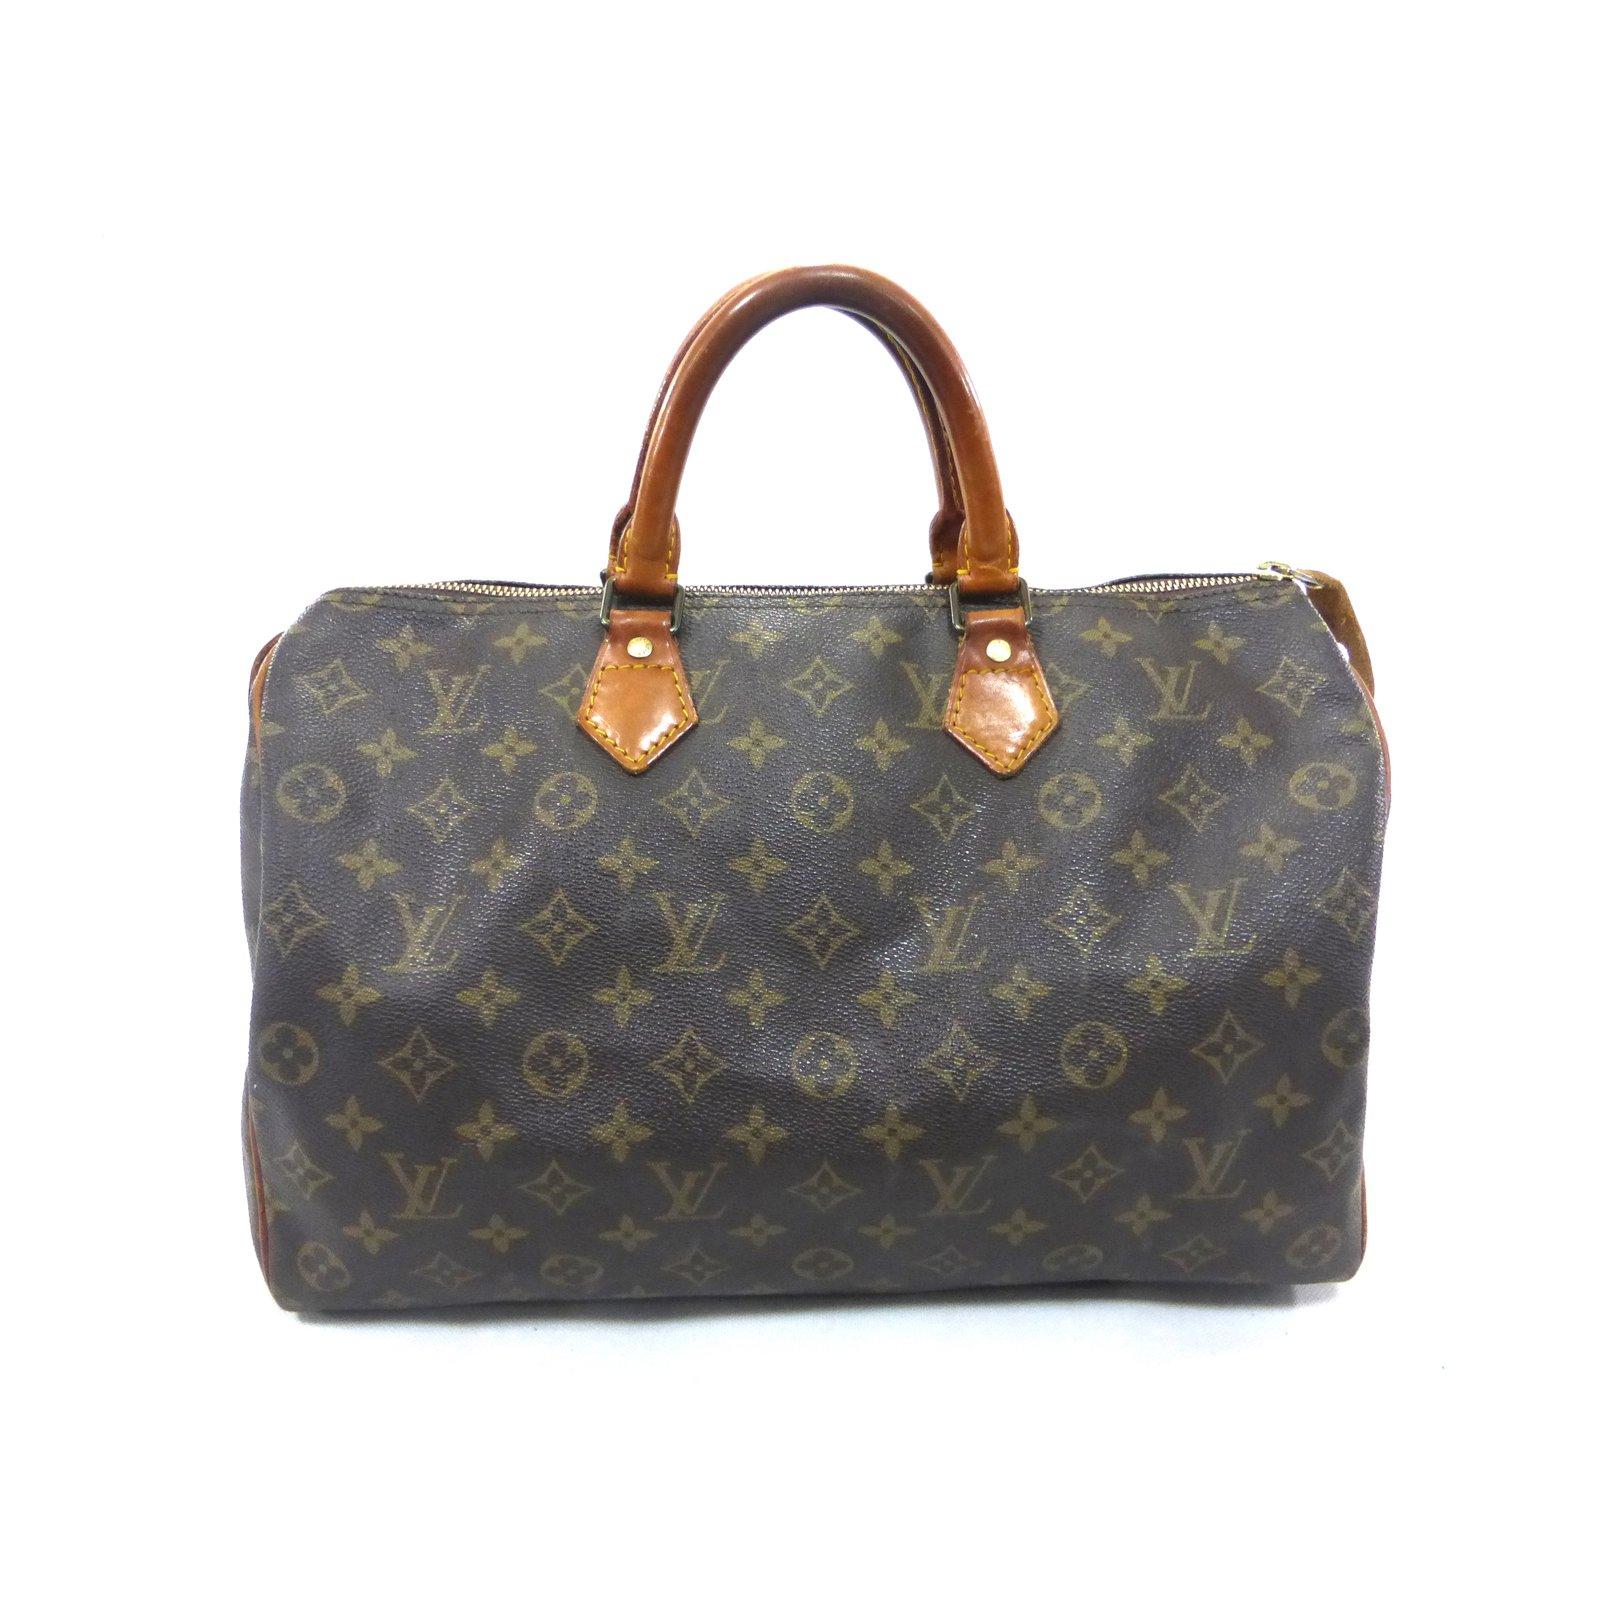 e6ef54f2f99e Louis Vuitton SPEEDY 35 MONOGRAM Handbags Leather Brown ref.92363 ...